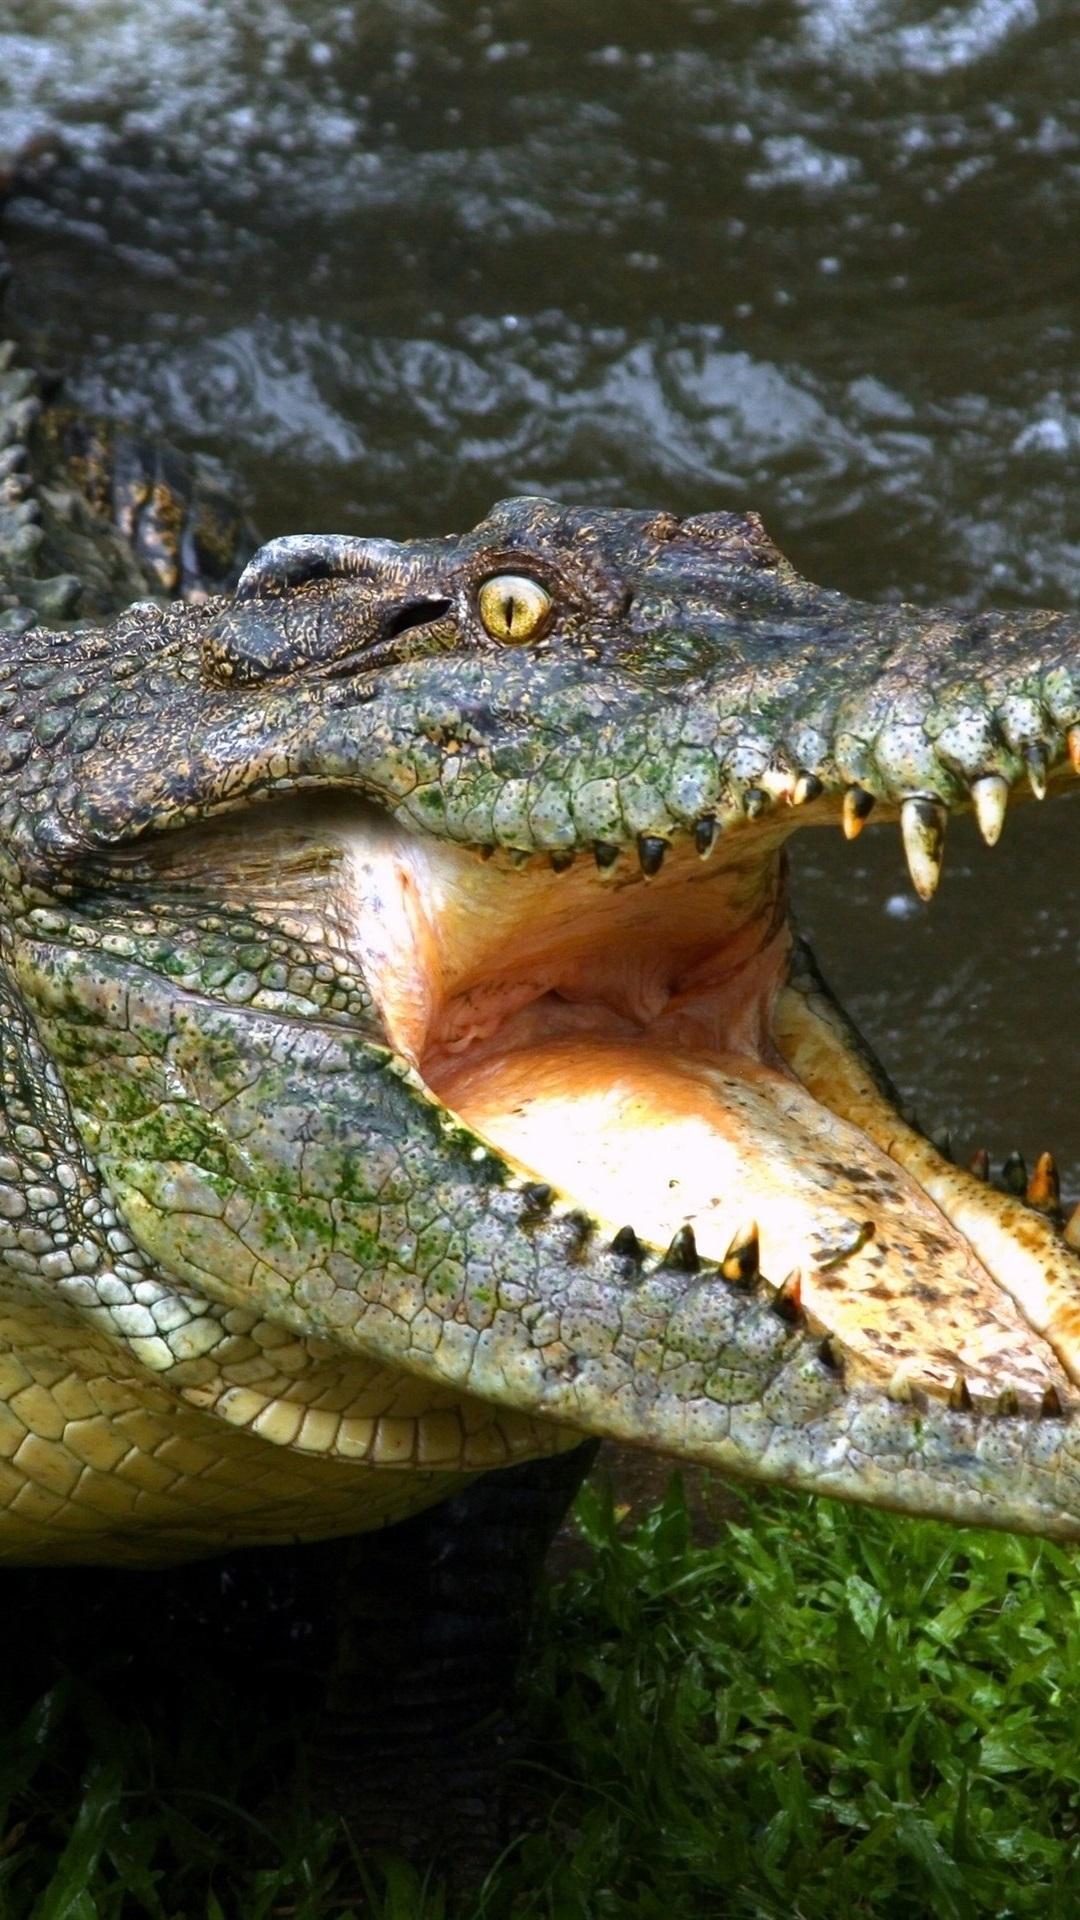 Crocodile Open Mouth Fangs Reptile 1080x1920 Iphone 8 7 6